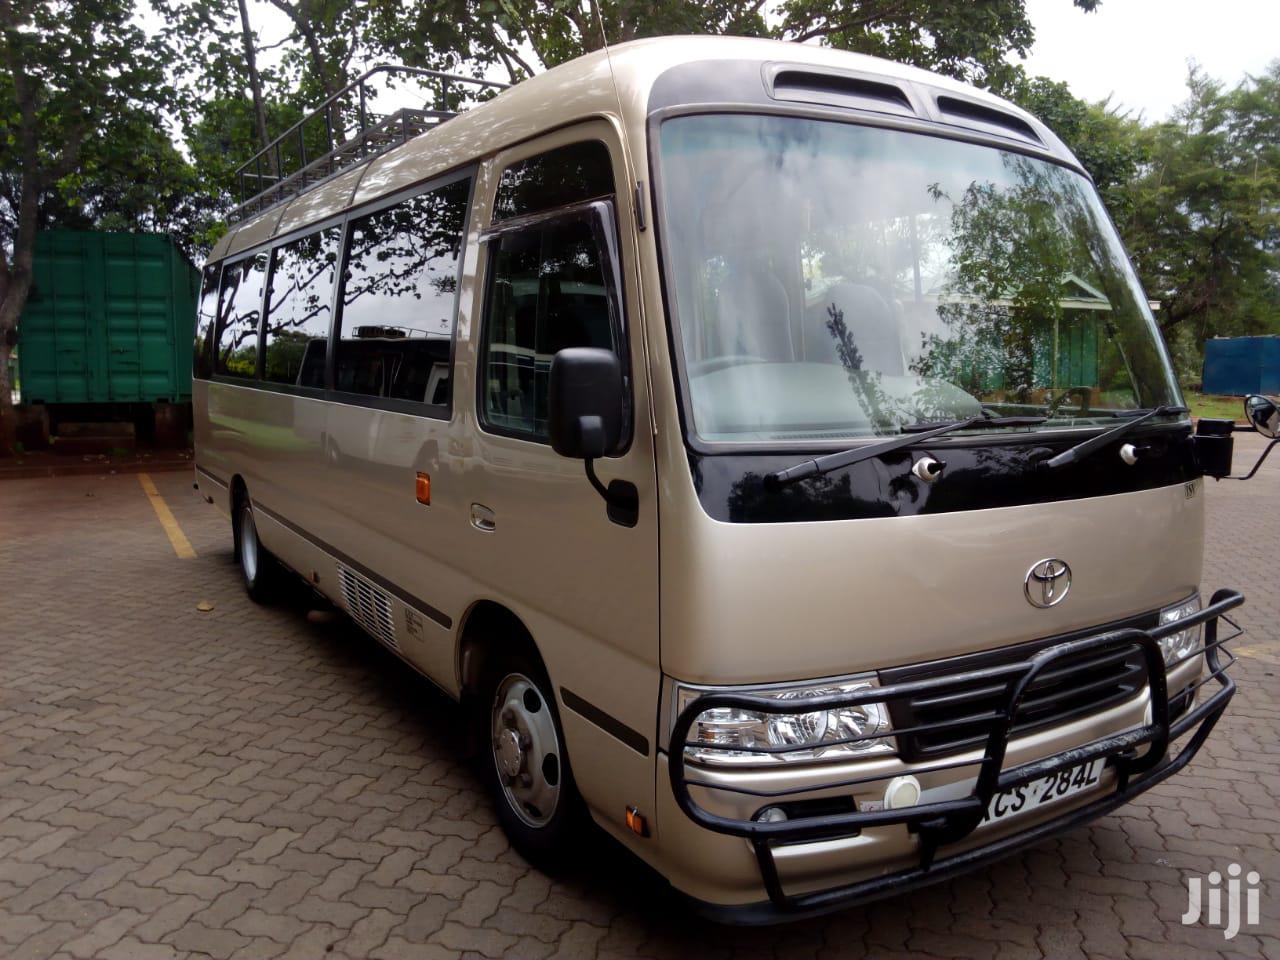 Minibus / Vans For Hire Within Nairobi | Travel Agents & Tours for sale in Kilimani, Nairobi, Kenya